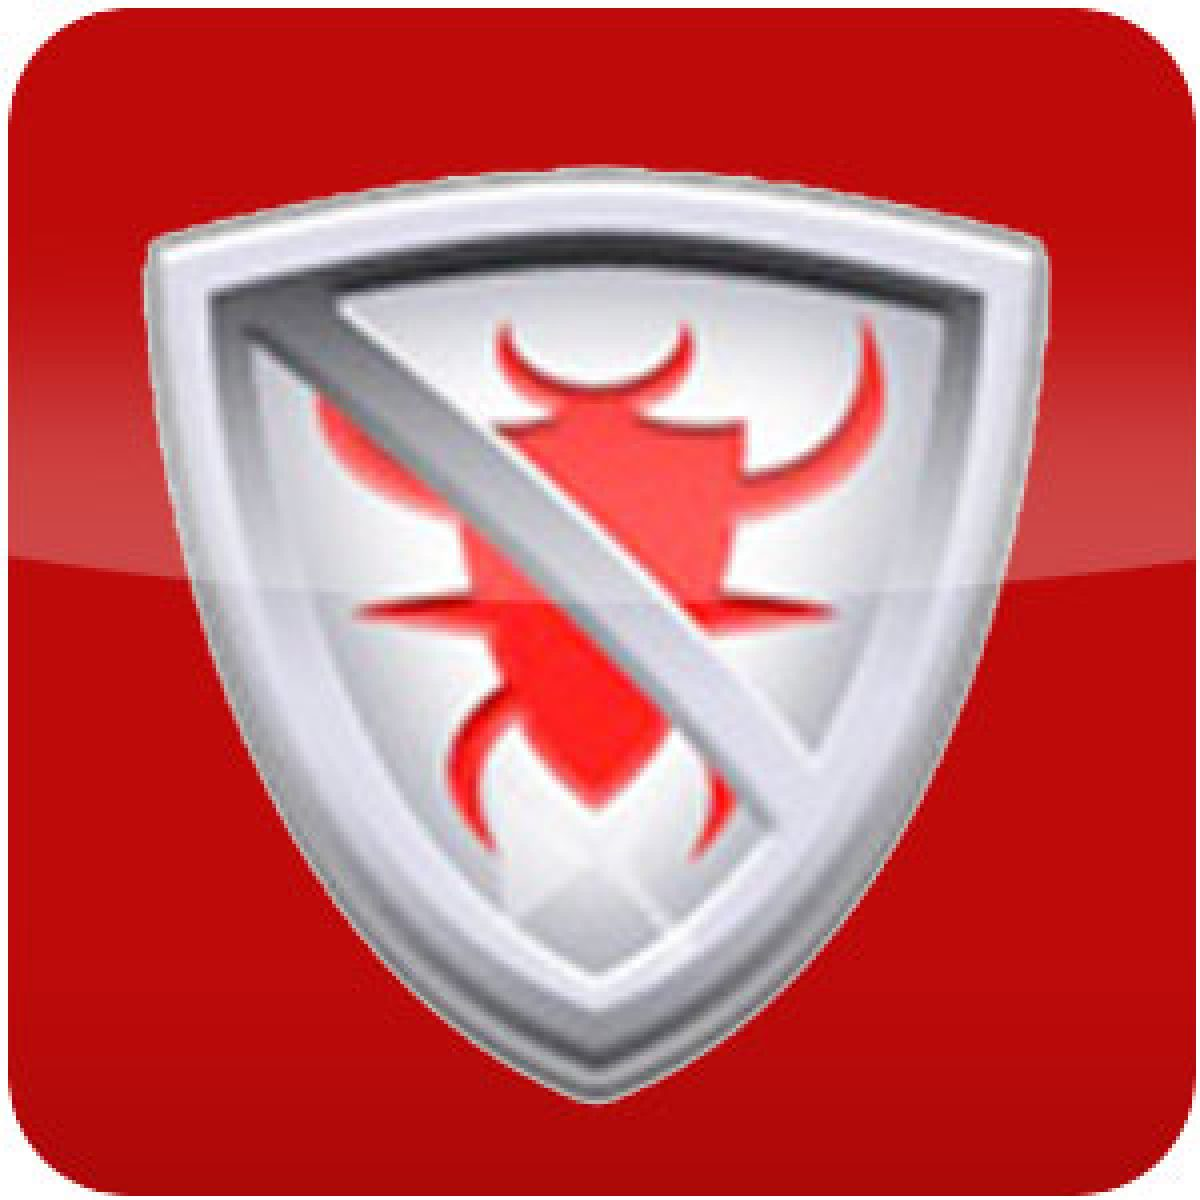 Ultra Adware Killer 9.7.3.0 Crack + Product Key Free Download